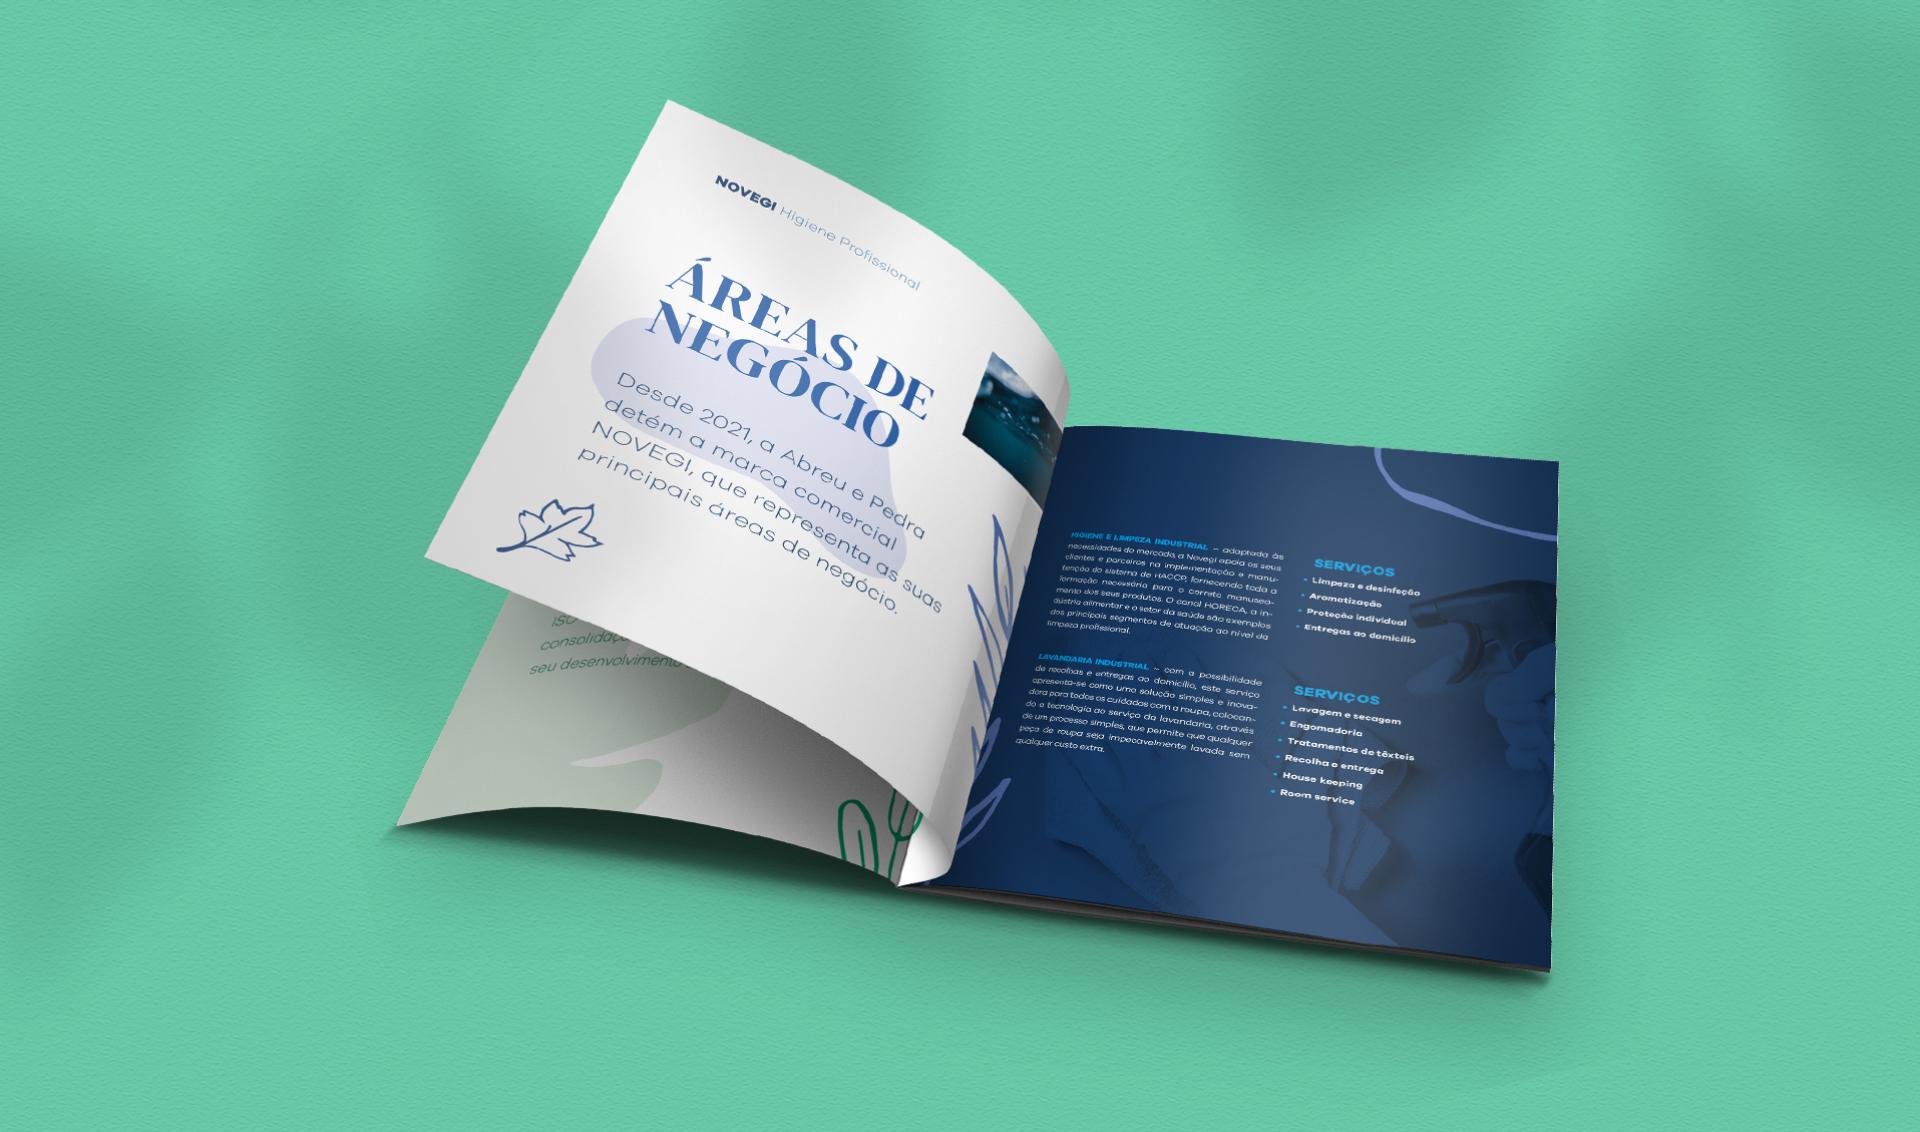 Catálogo Novegi aberto